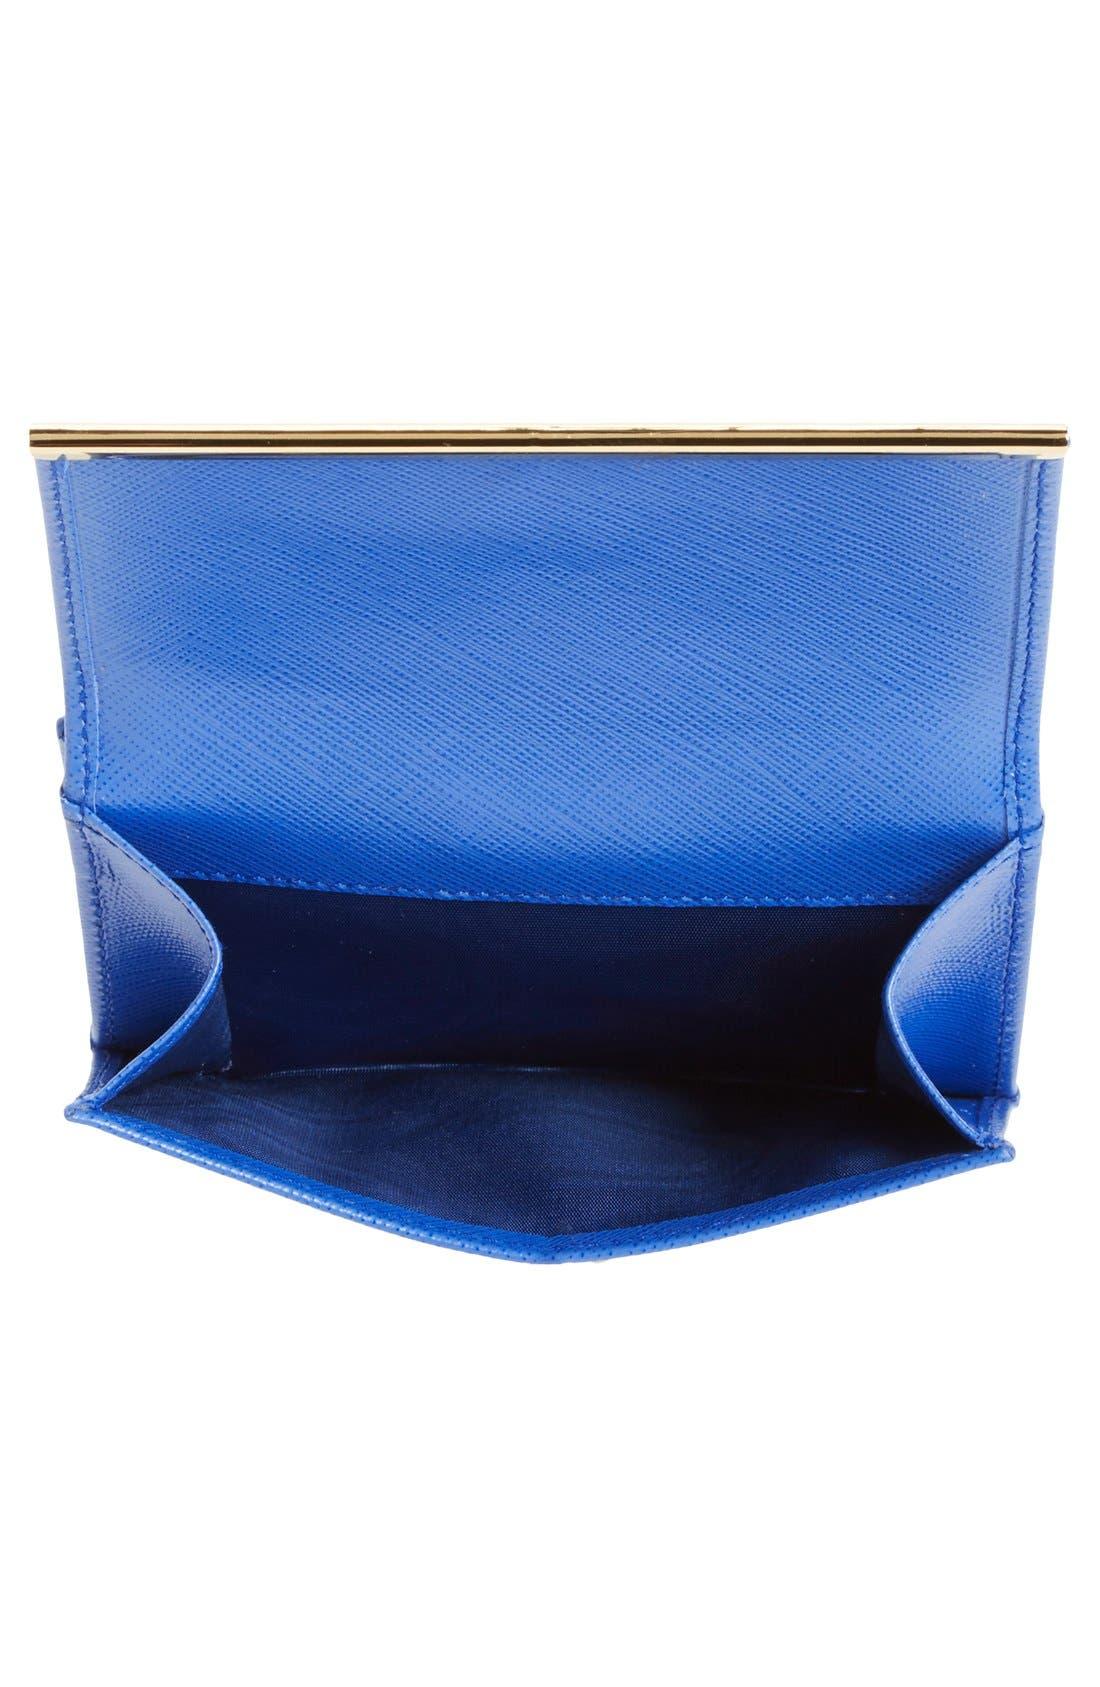 Alternate Image 2  - Salvatore Ferragamo Saffiano Calfskin Leather Wallet